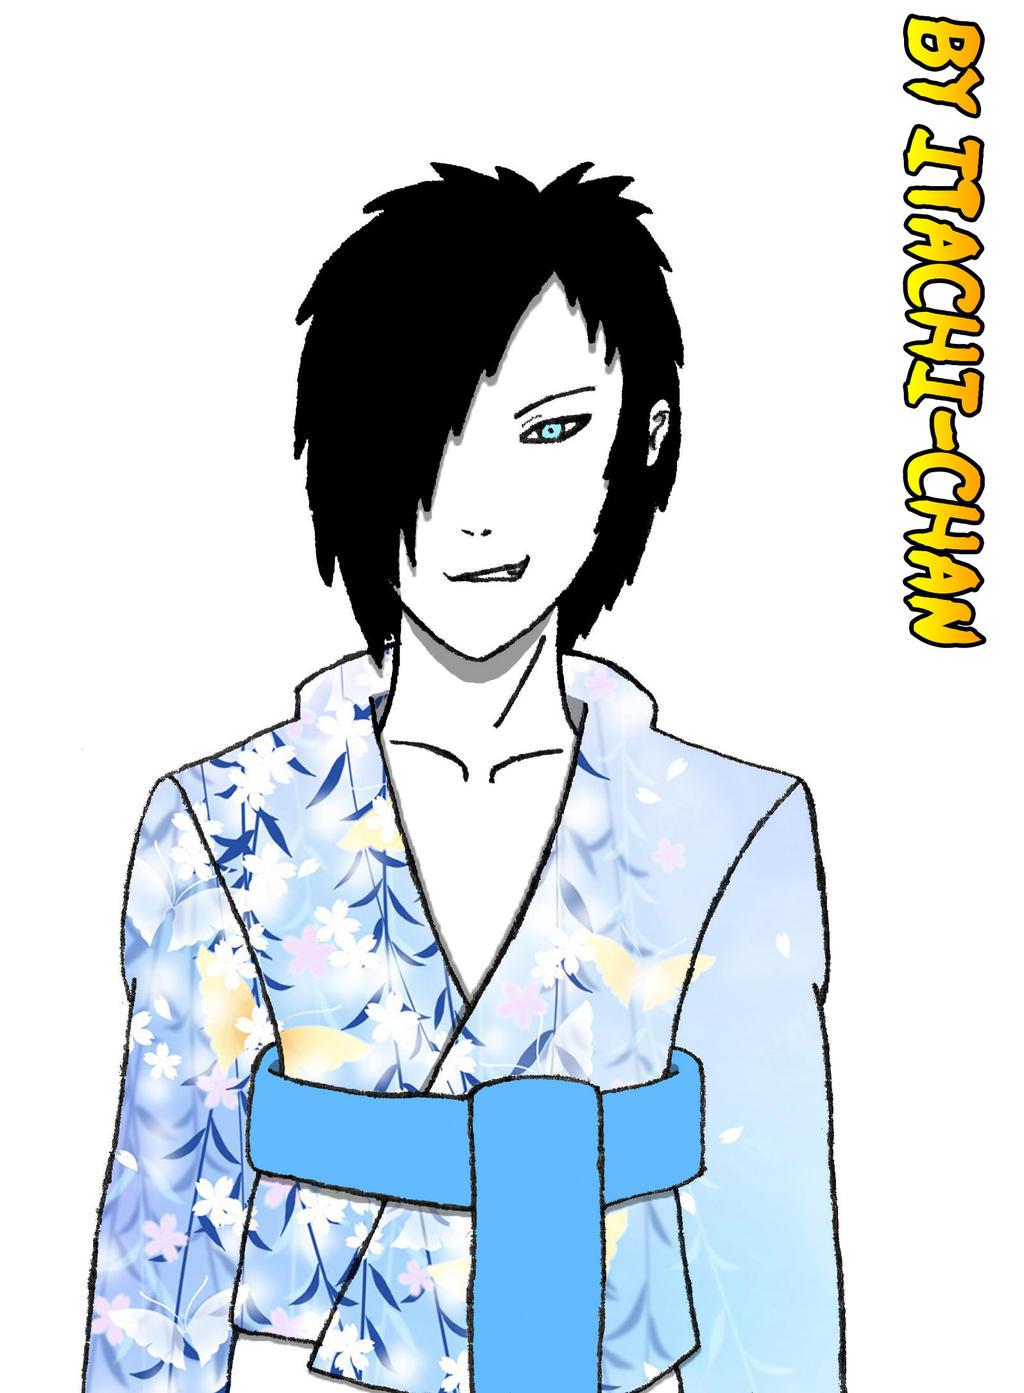 Gokumi Tsukiro - Big brother of Gokumi Joke by Gokumi